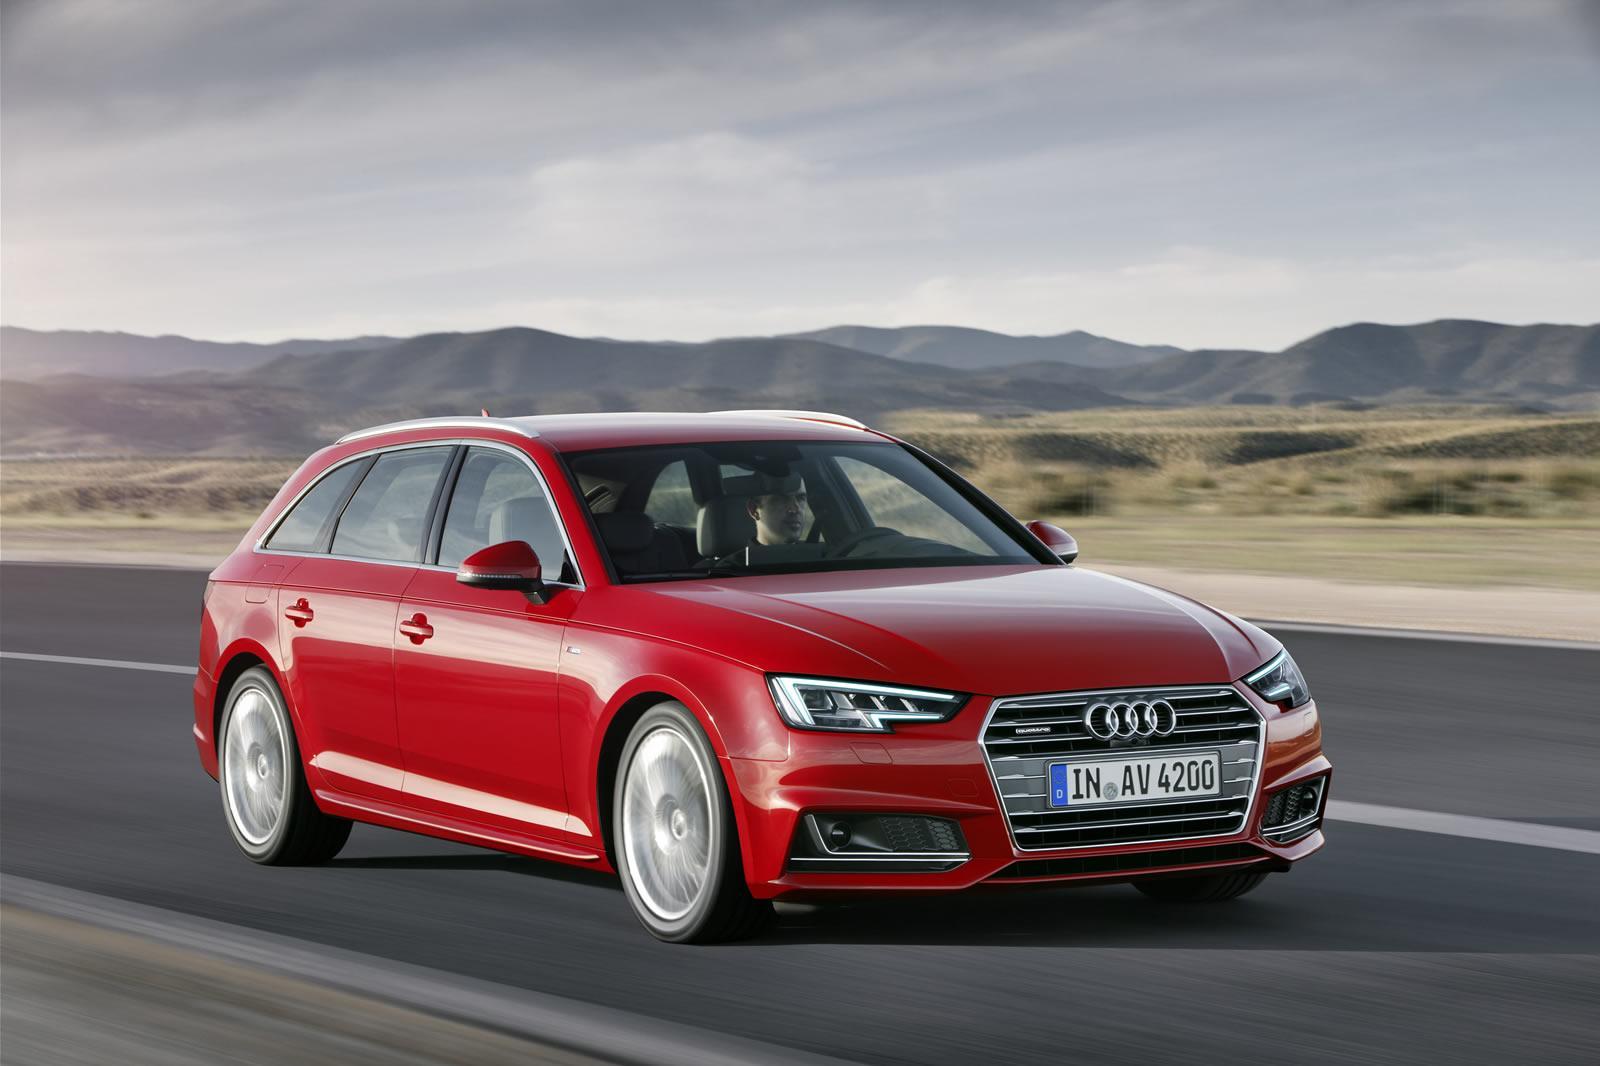 2016 Audi A4 Avant B9 Photos Videos And Details